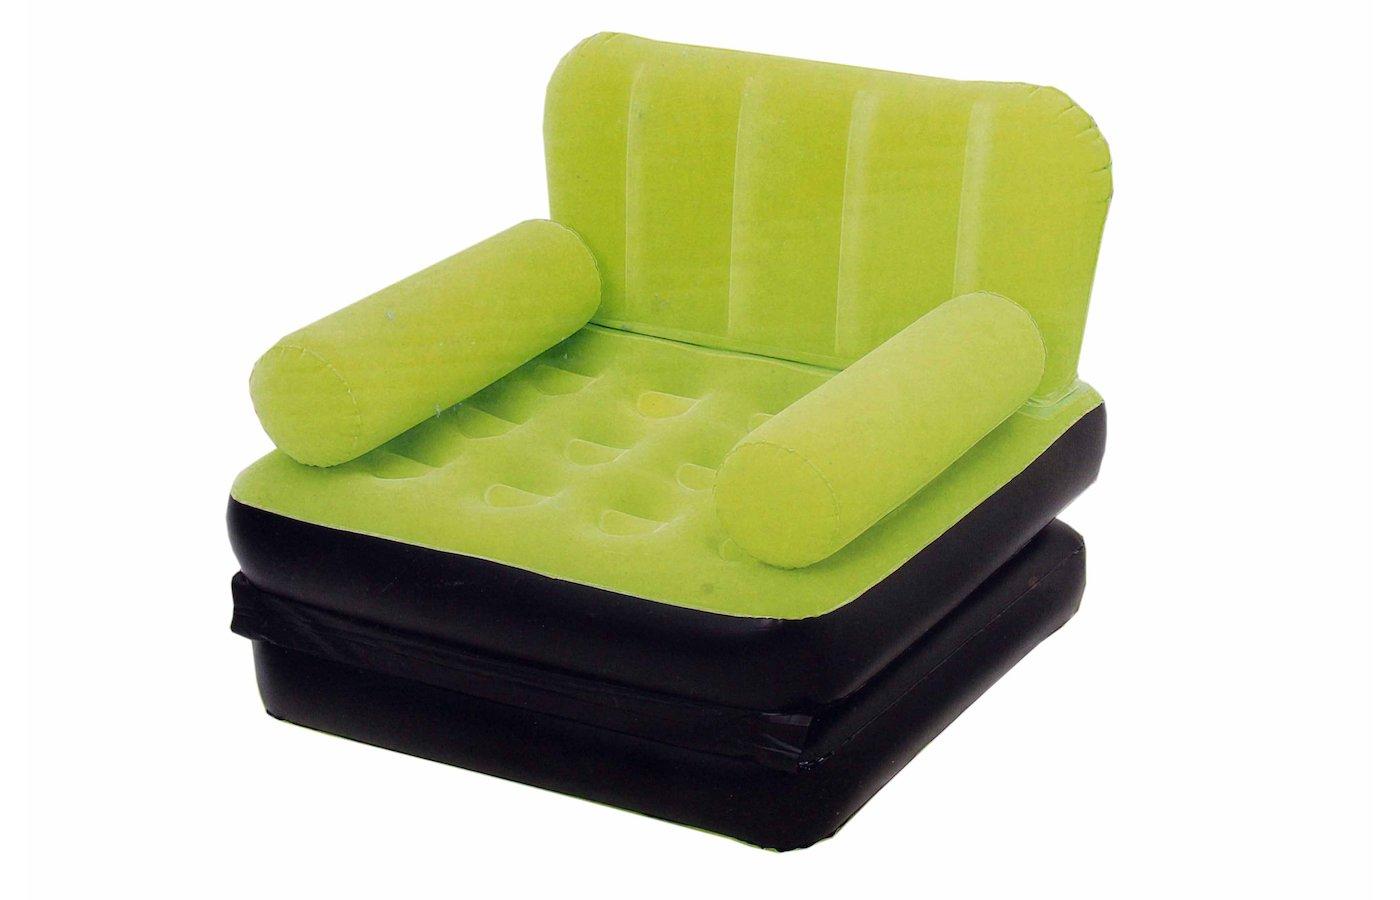 Кресло надувное BESTWAY 67277N Кресло-кровать надувное 191х97х64см